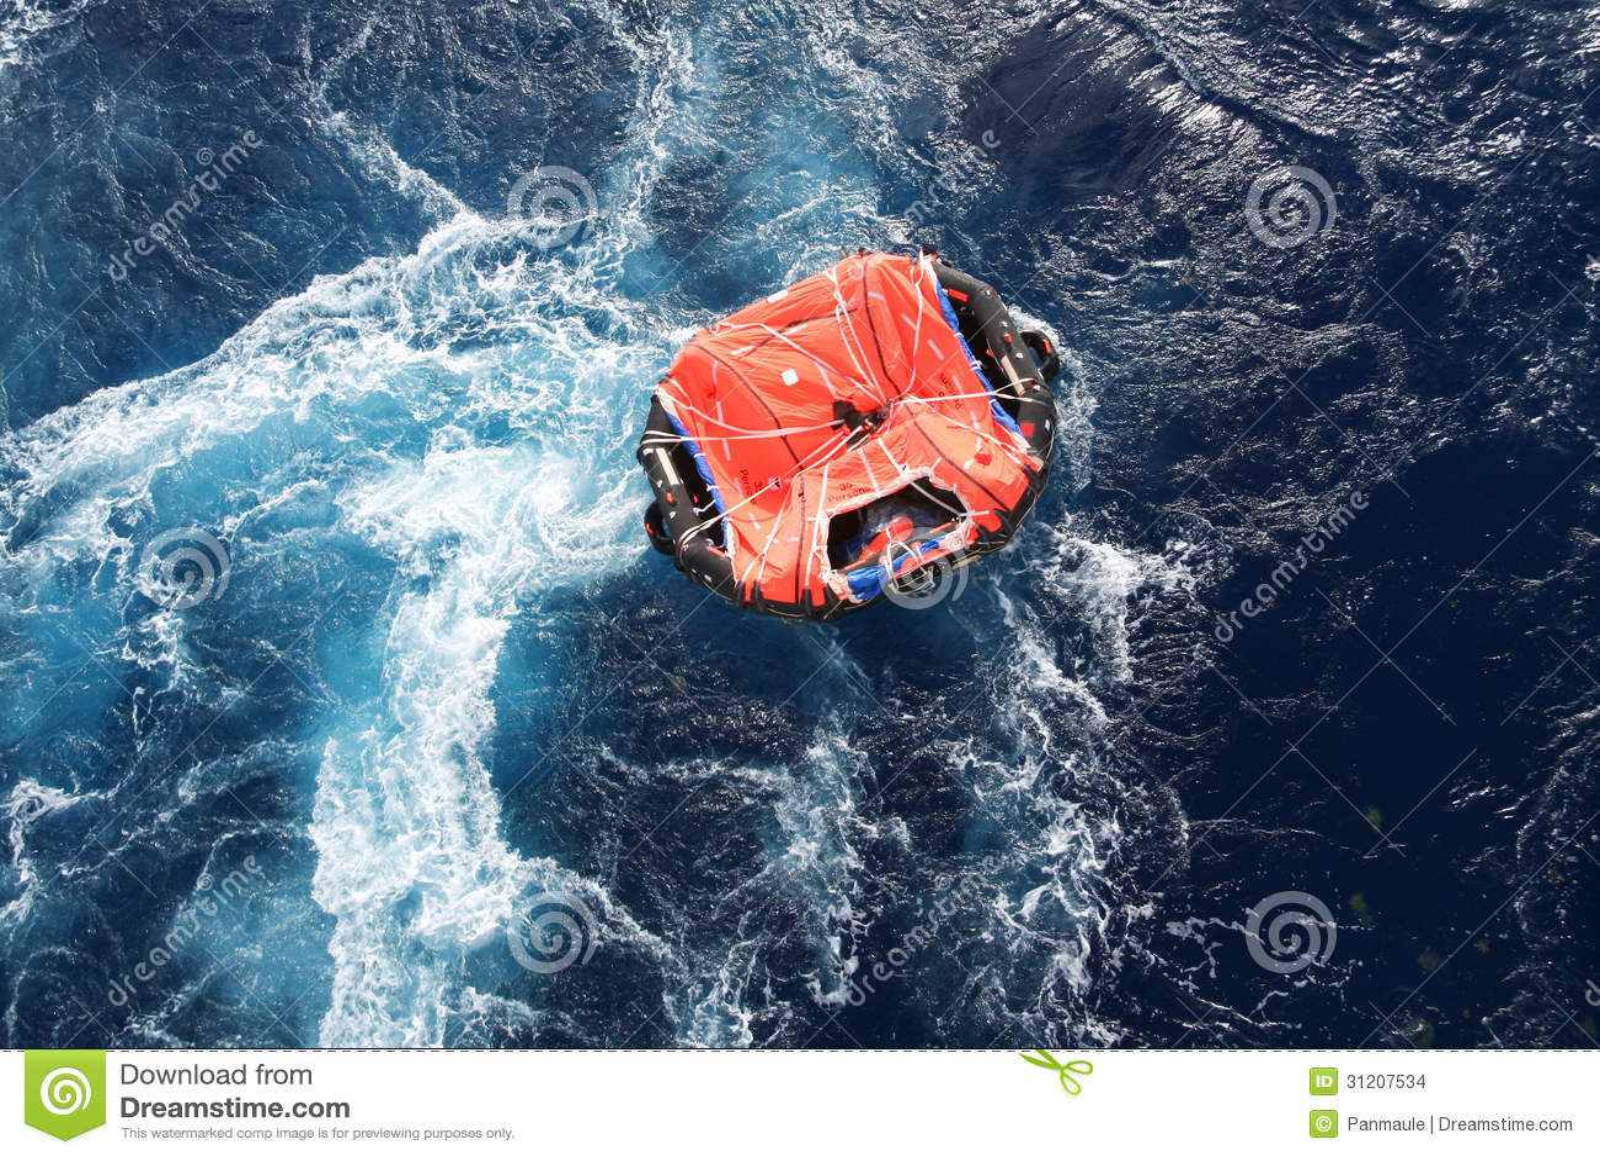 Life Raft Stock Images - Image: 31207534